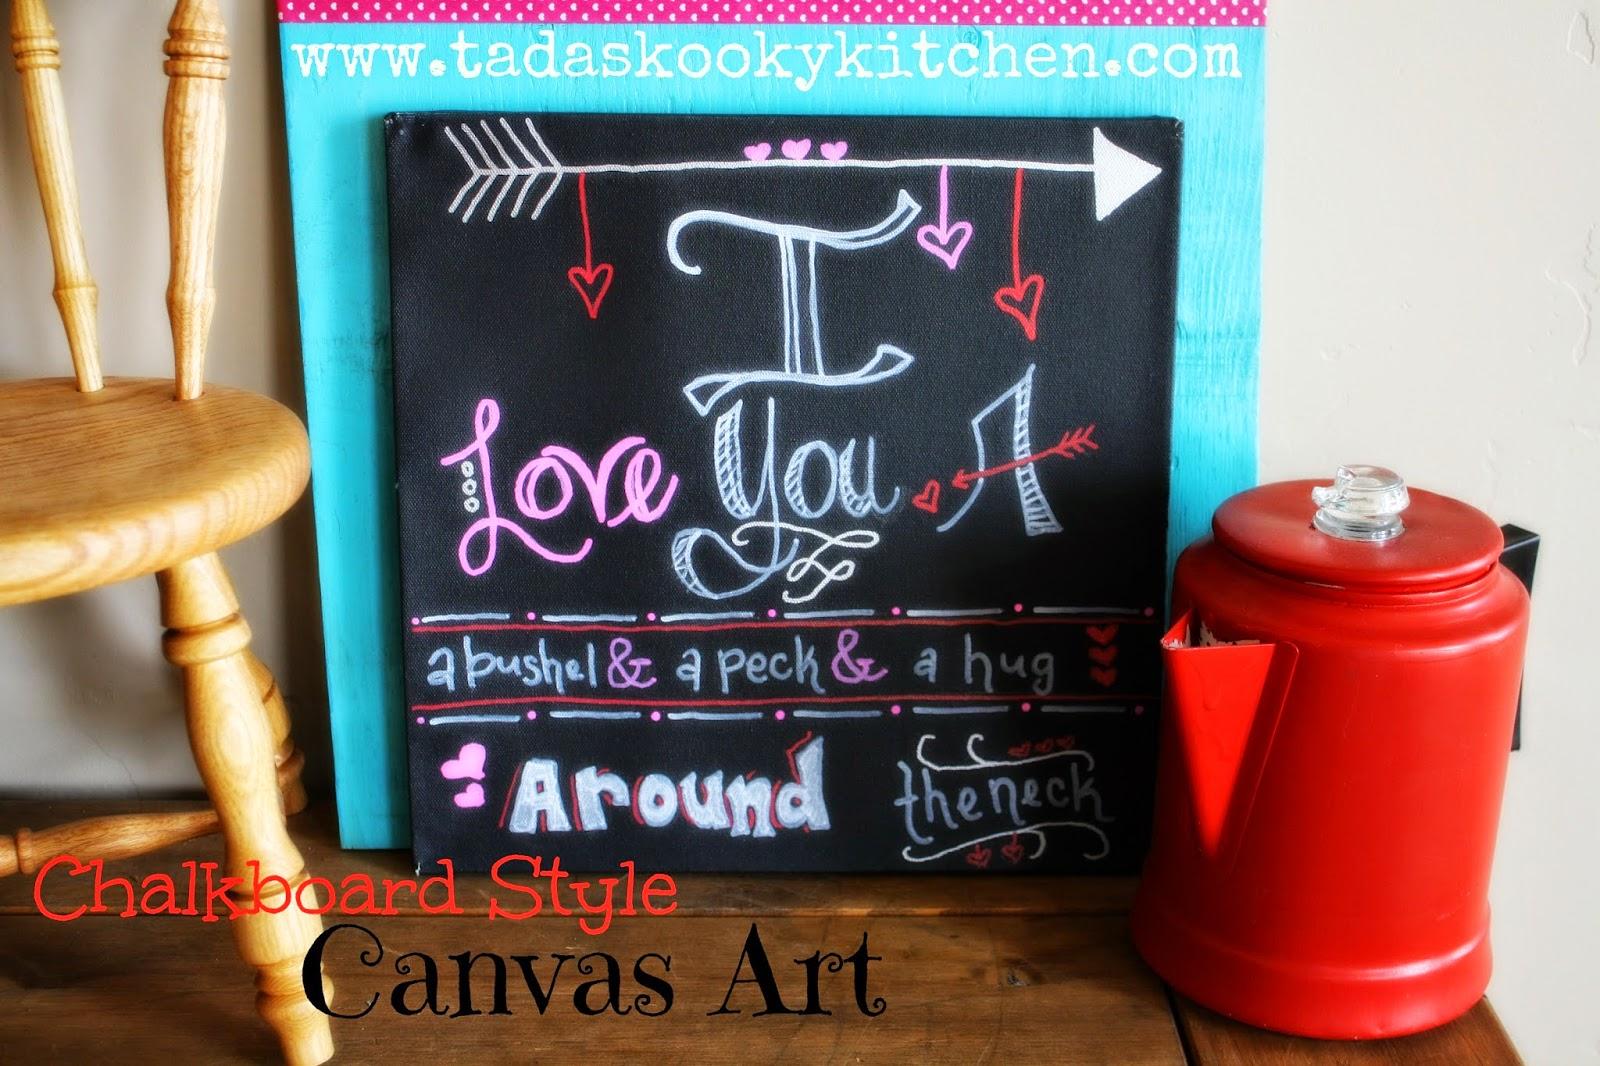 VALENTINESchalkboard style canvas art